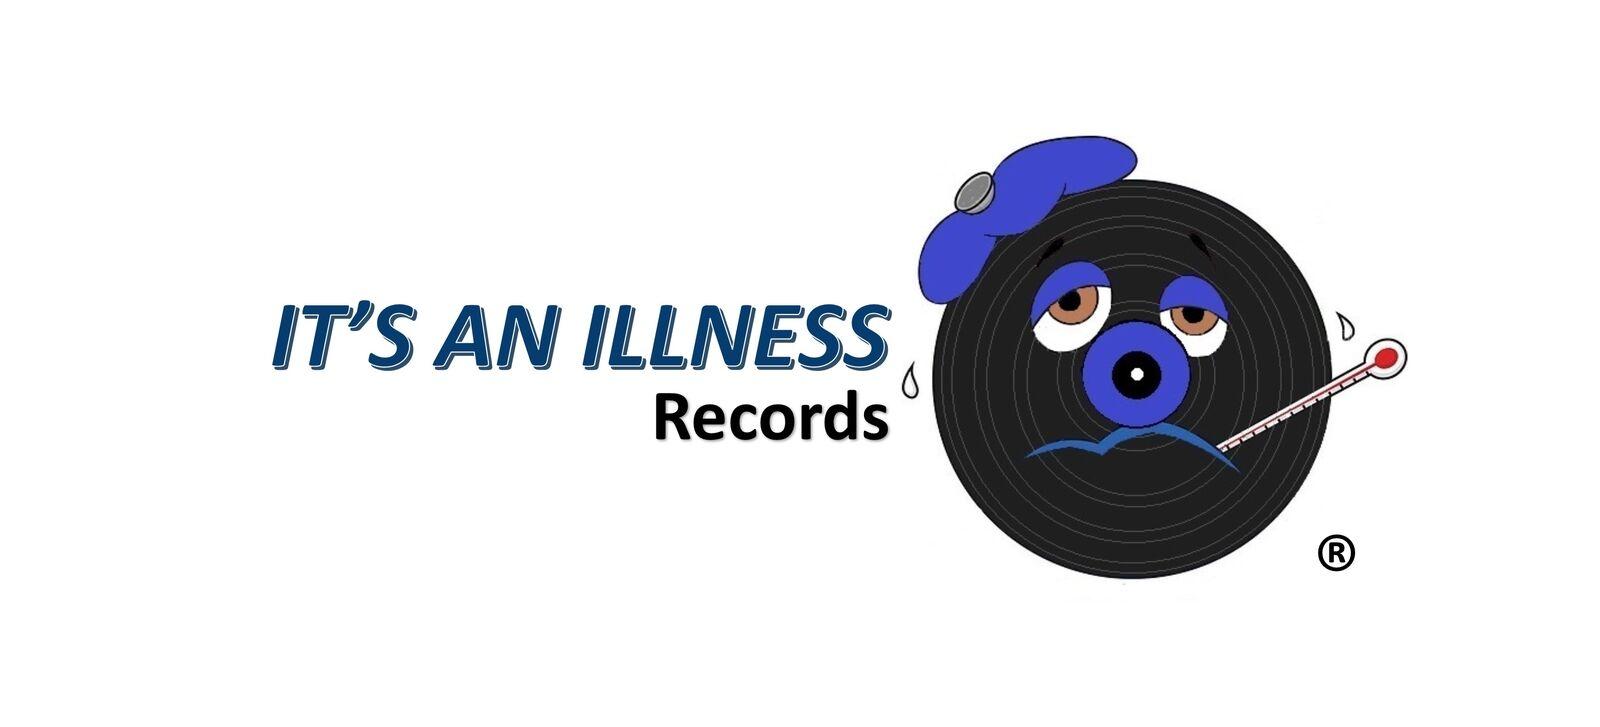 It's An Illness Records